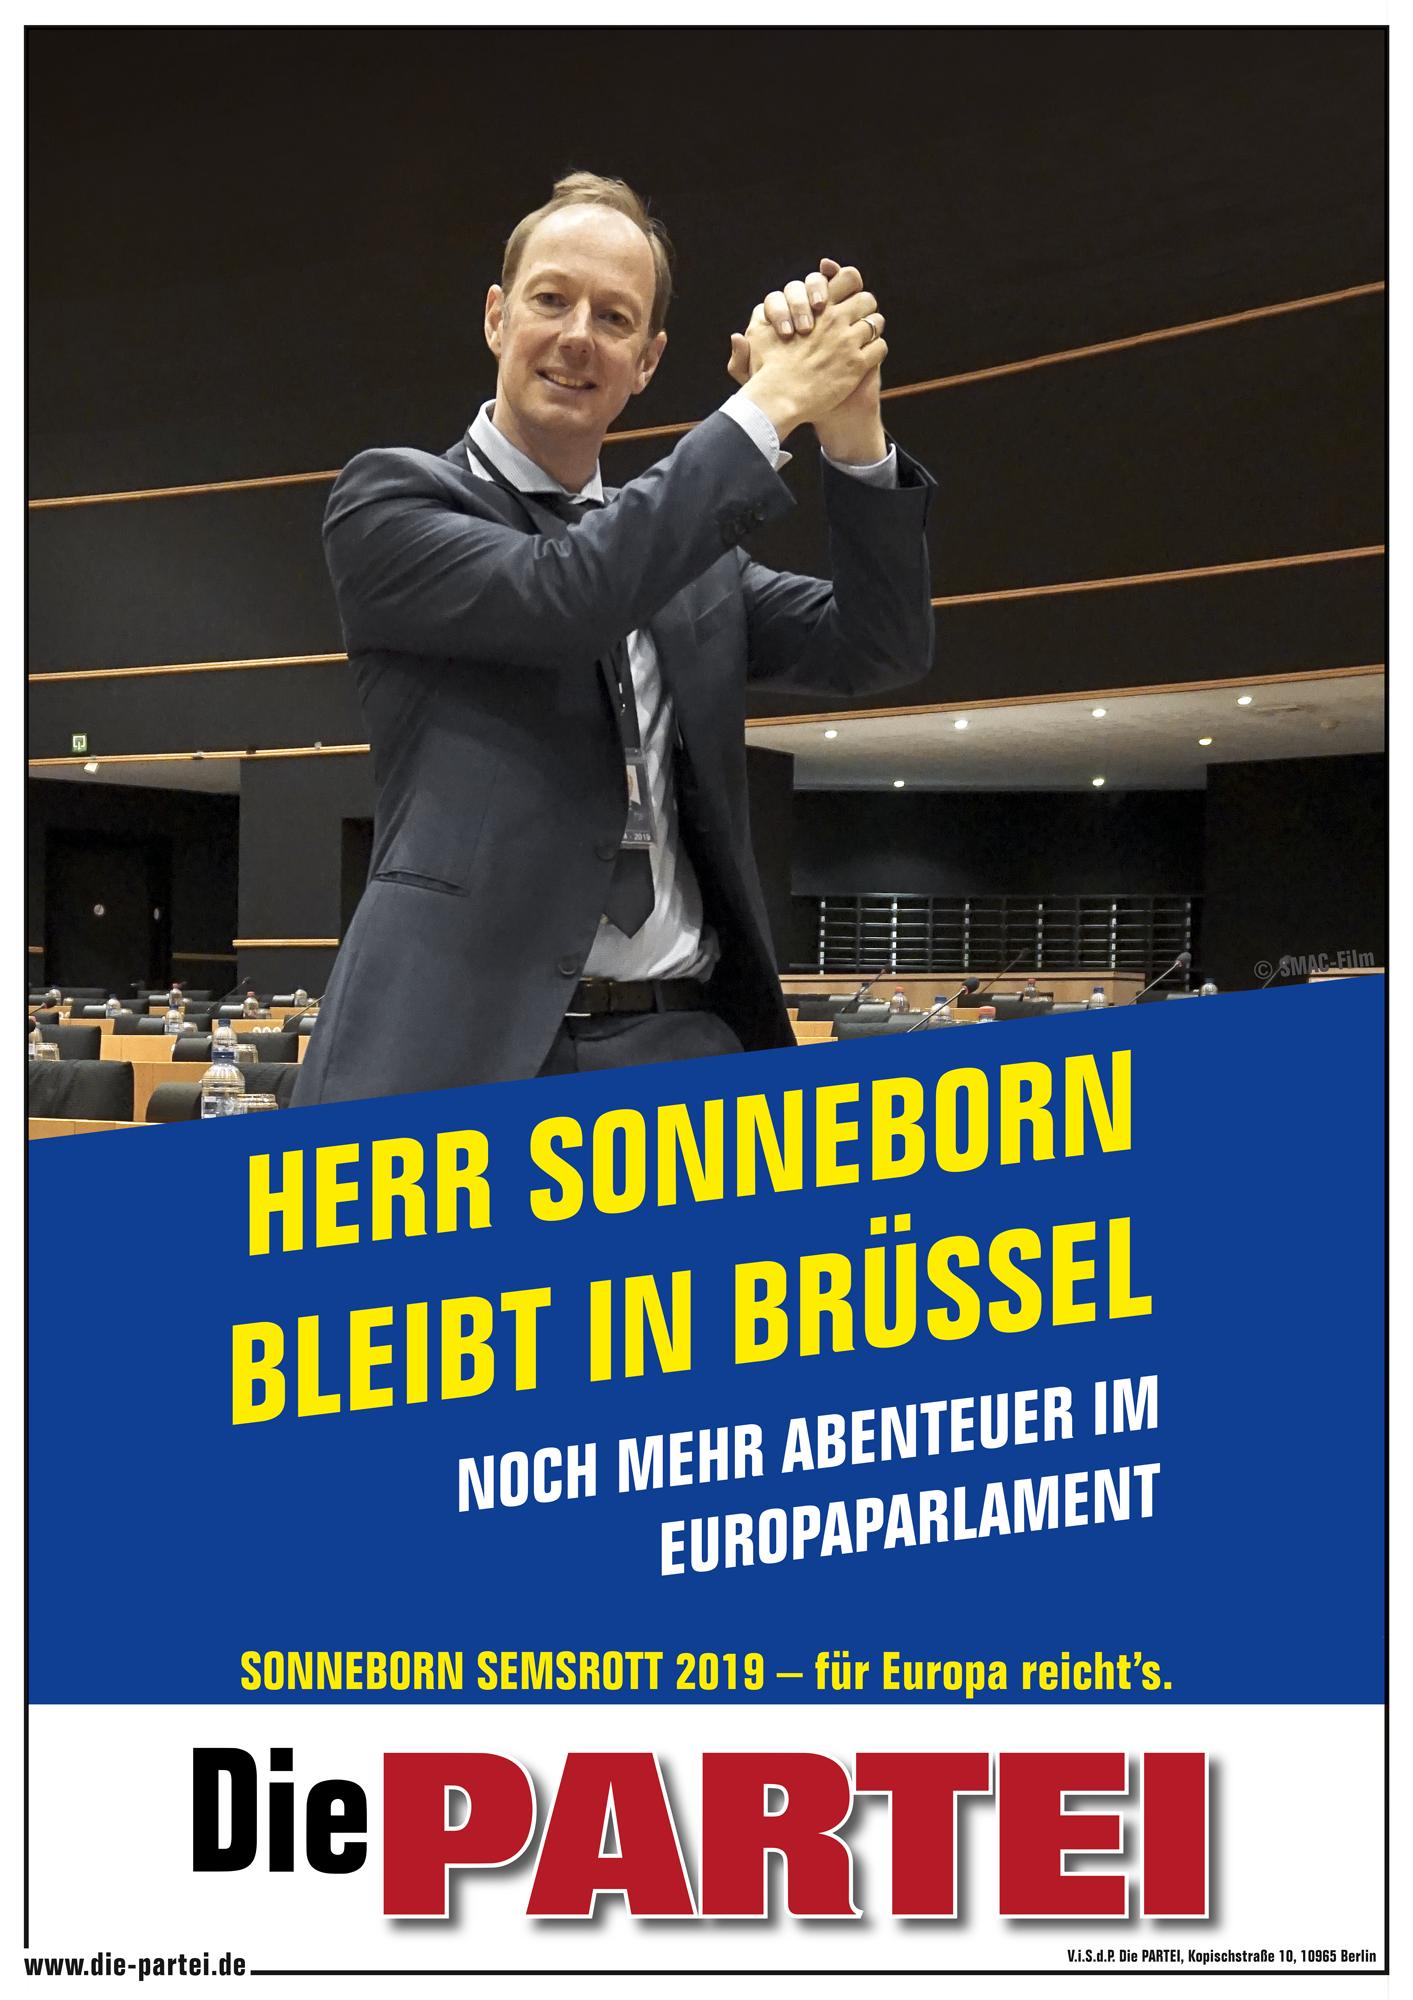 Partei Liebe Europawahl